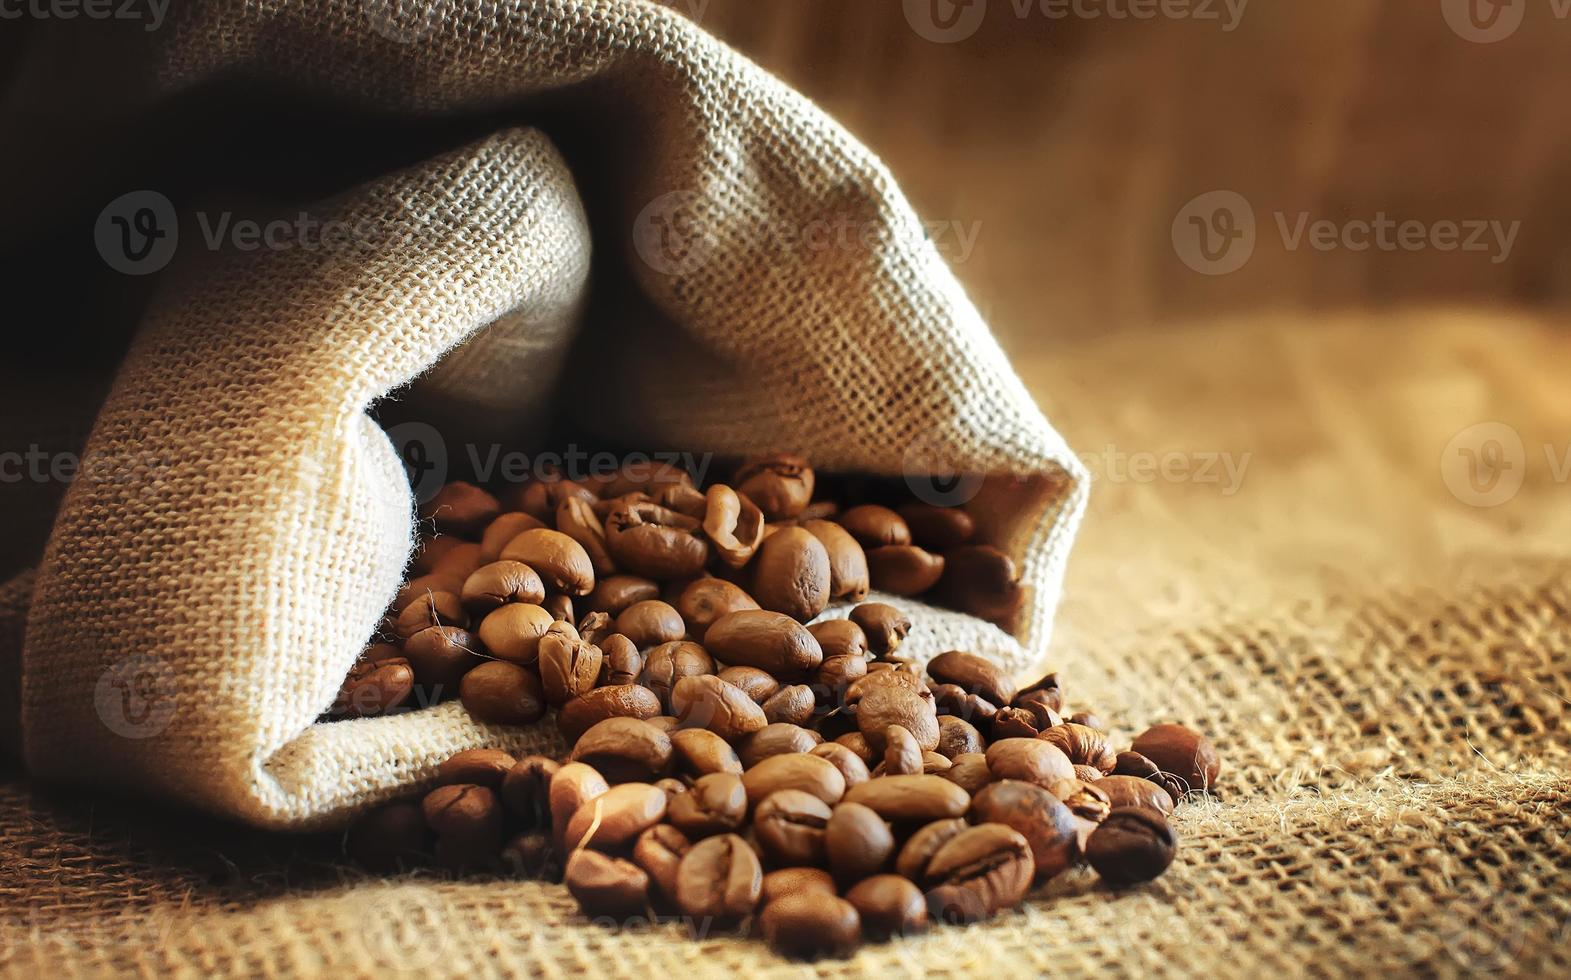 granos de café tostado se derraman de la bolsa foto